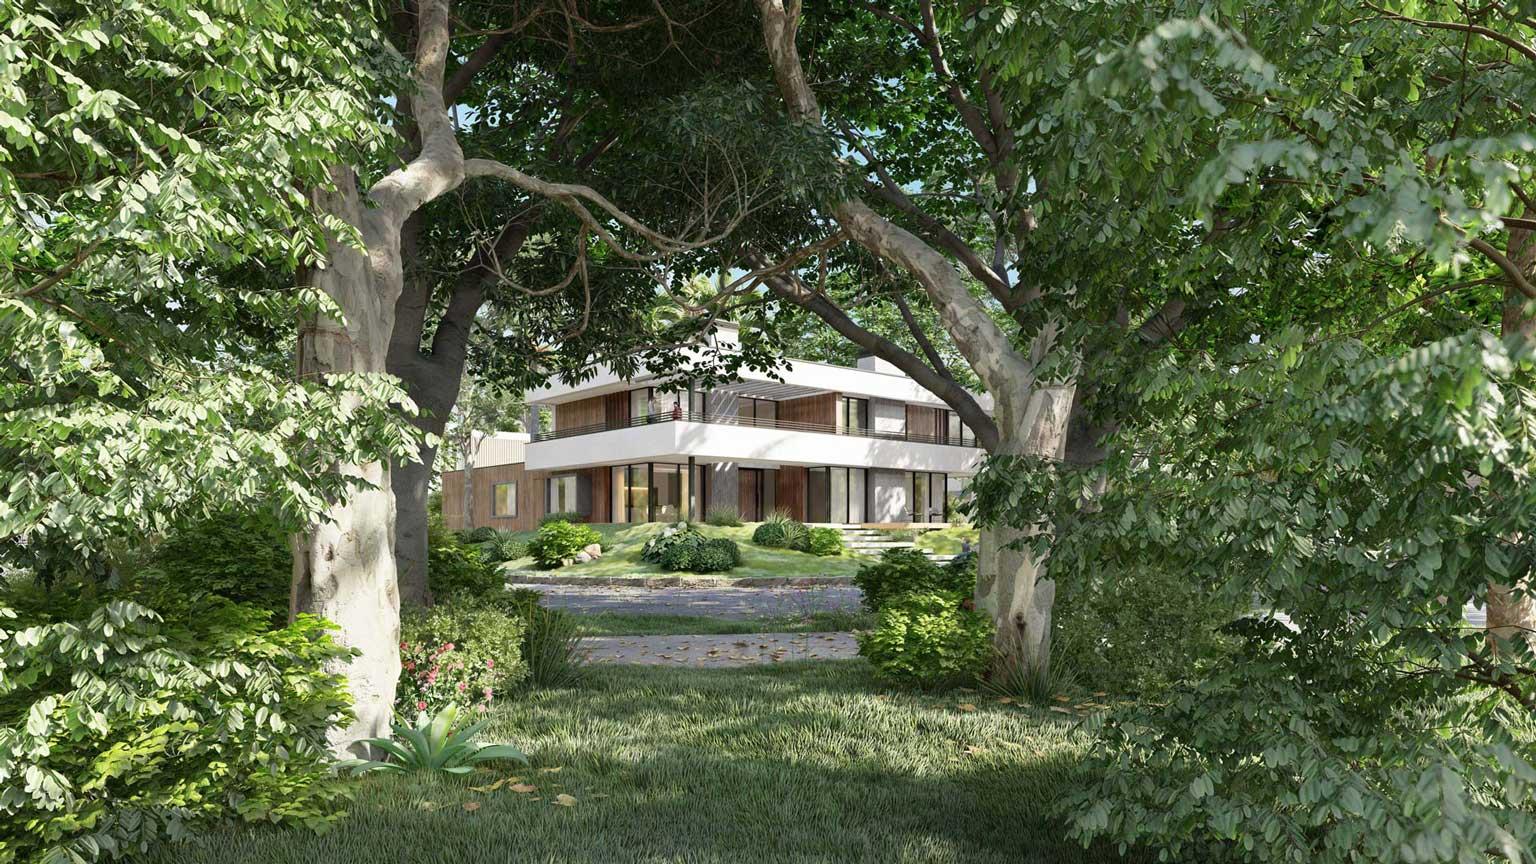 Residential-Exterior-Van-Manen-1536x864Lumion10